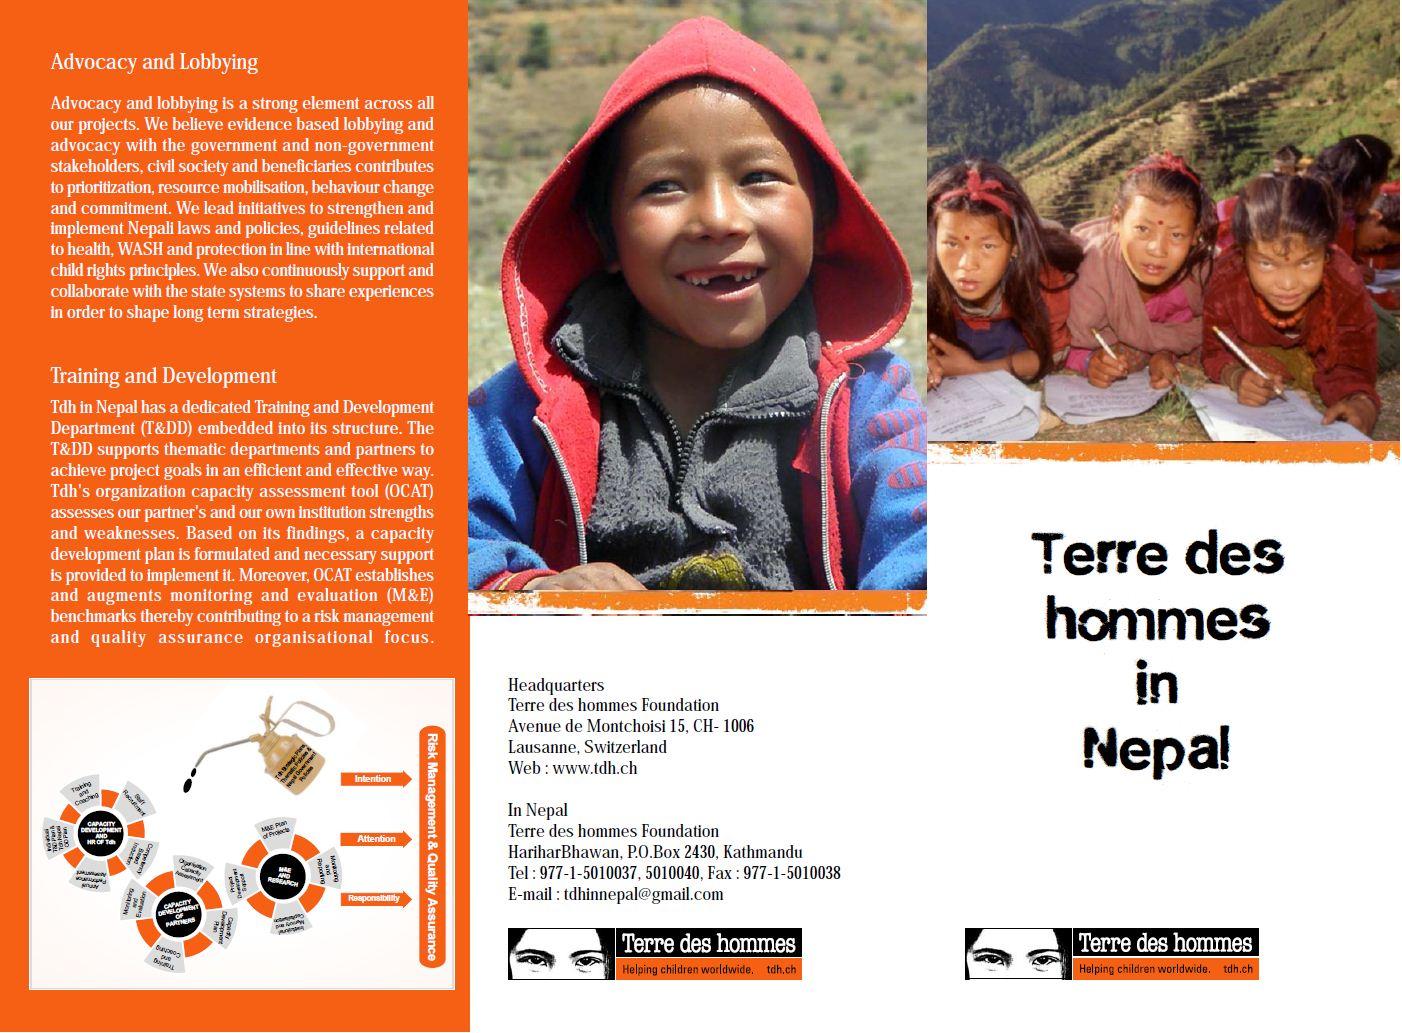 01d14d7e-898c-4940-bb75-1b87767a1b85_nepal_cover_original